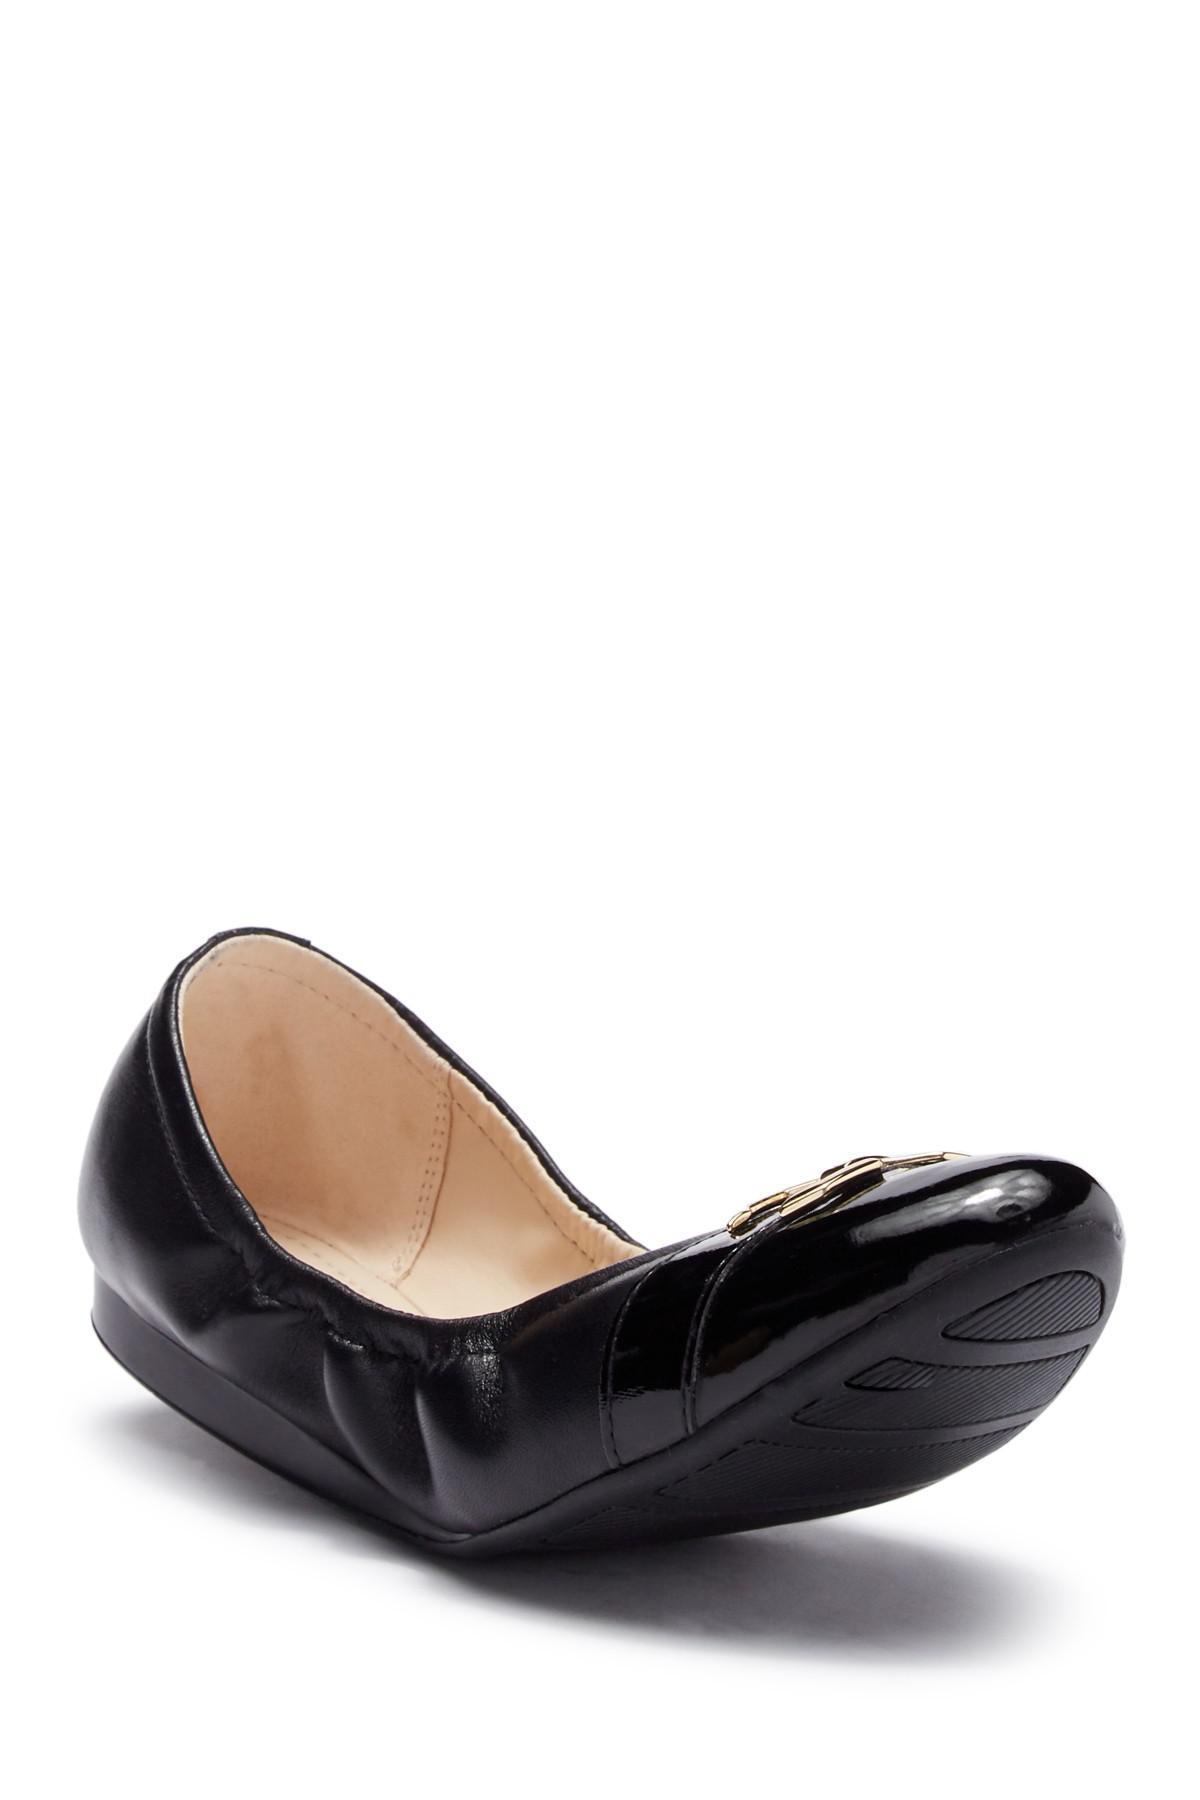 8b778cdfec3 Lyst - Cole Haan Terrin Leather Ballet Flat in Black